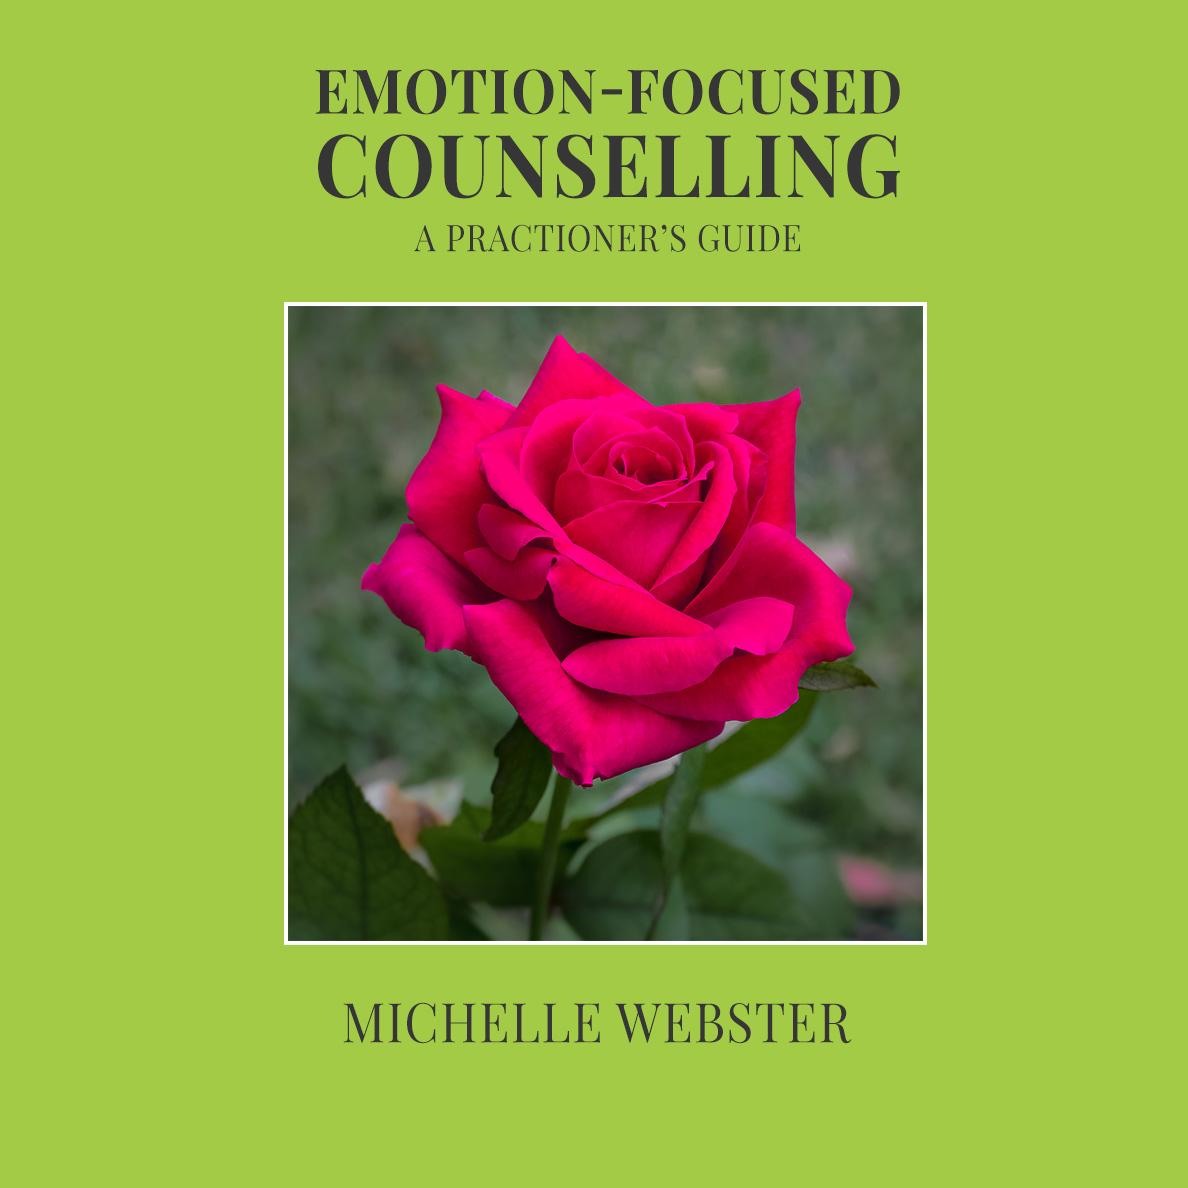 EmotionFocusedCounselling_Cover_03.jpg